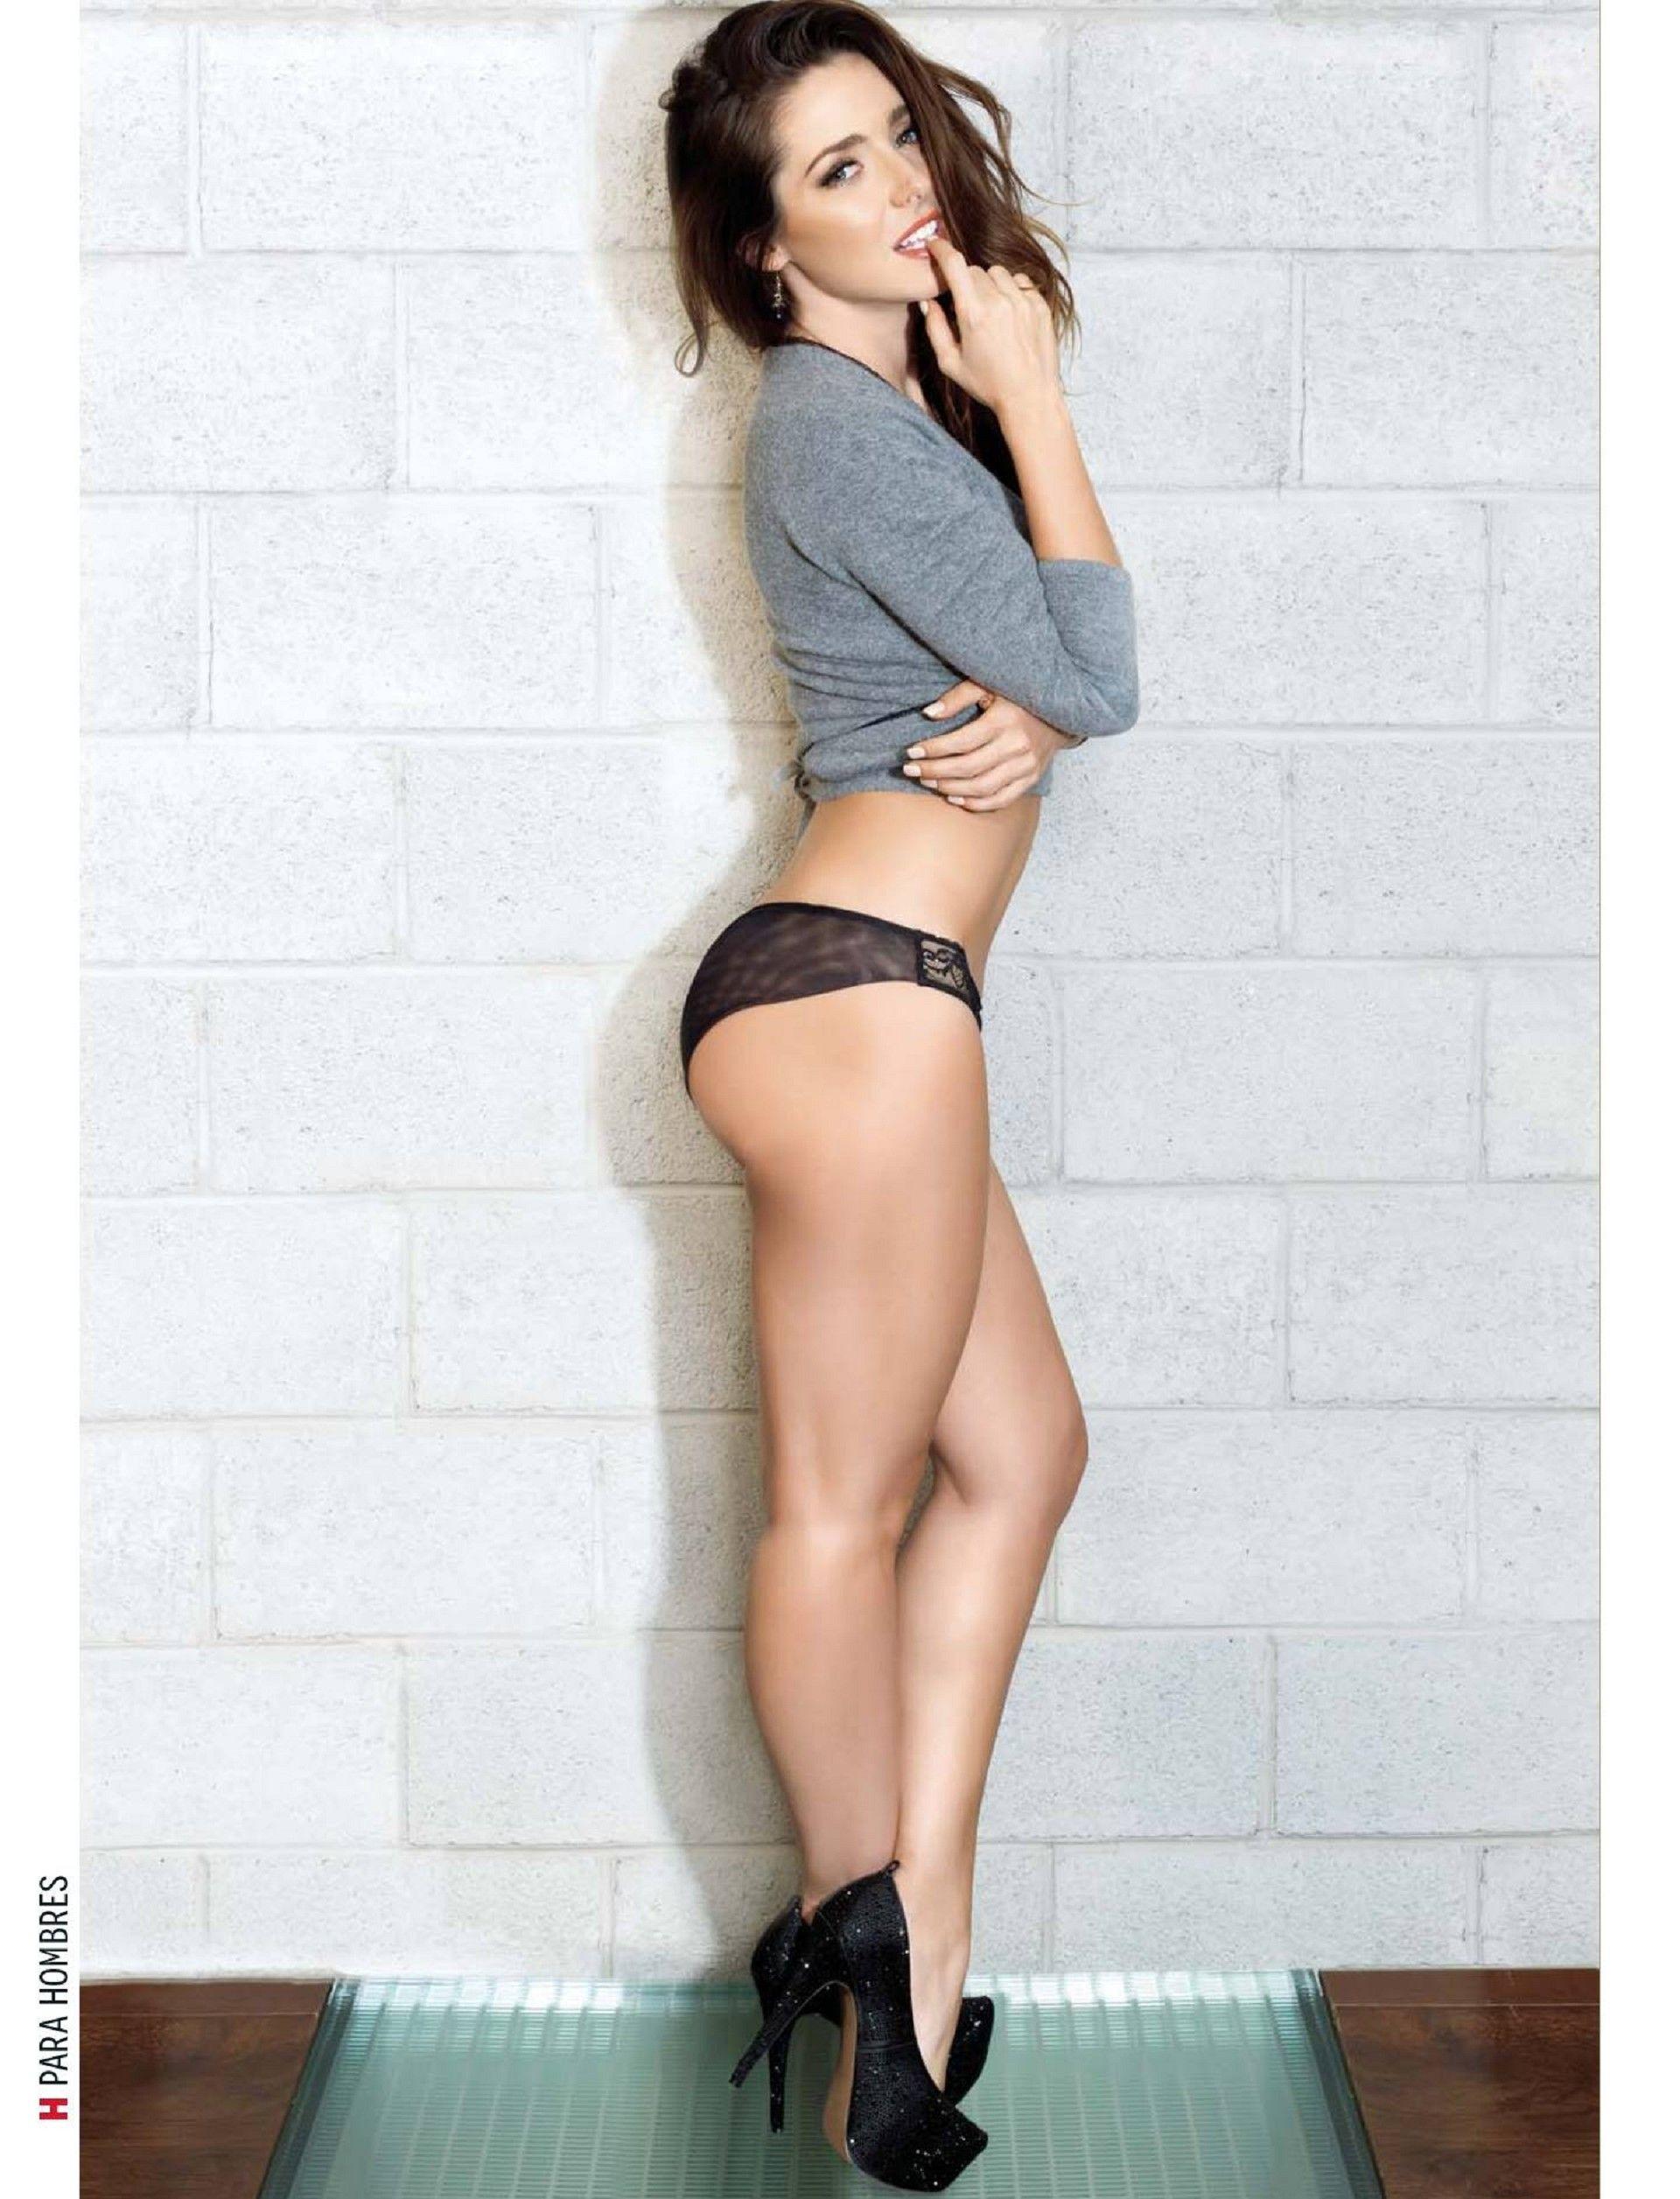 Ariadne Diaz - H Para Hombres_18 #AriadneDiaz #HParaHombres